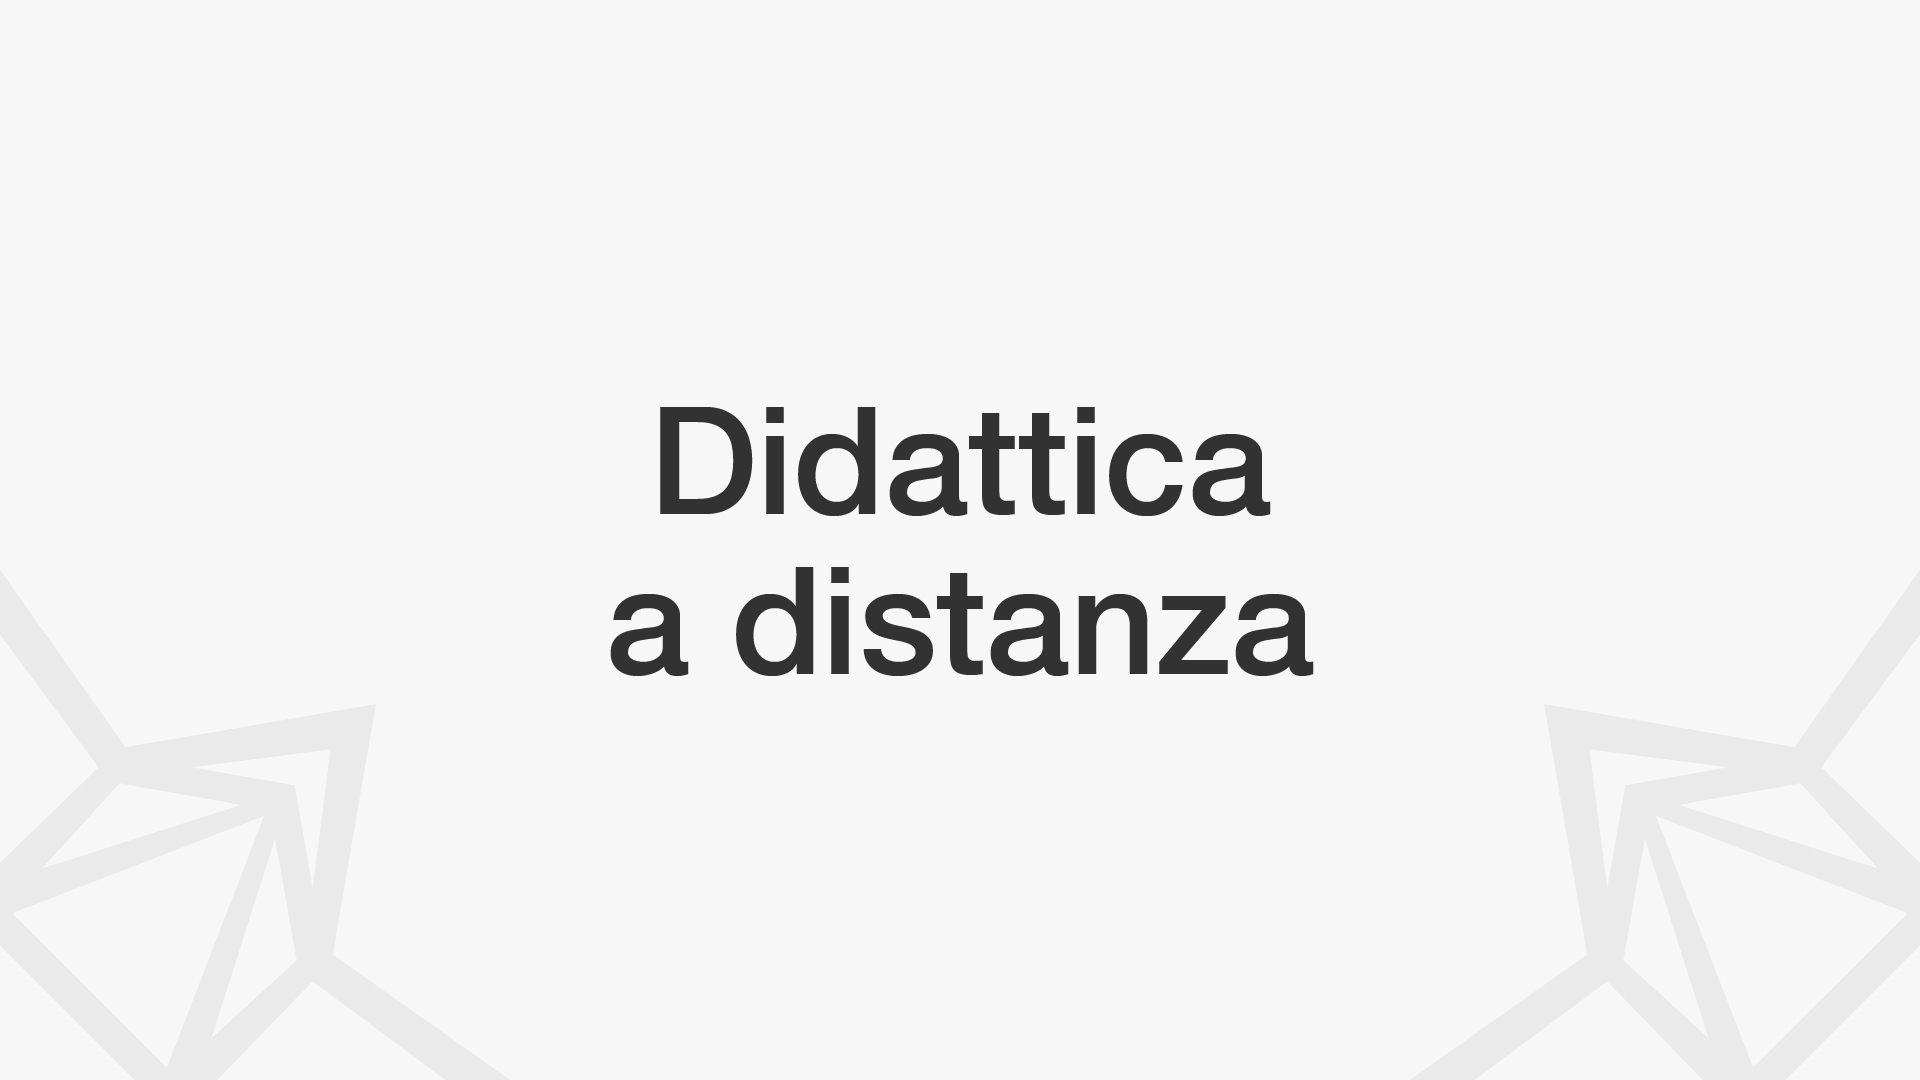 Didattica a distanza